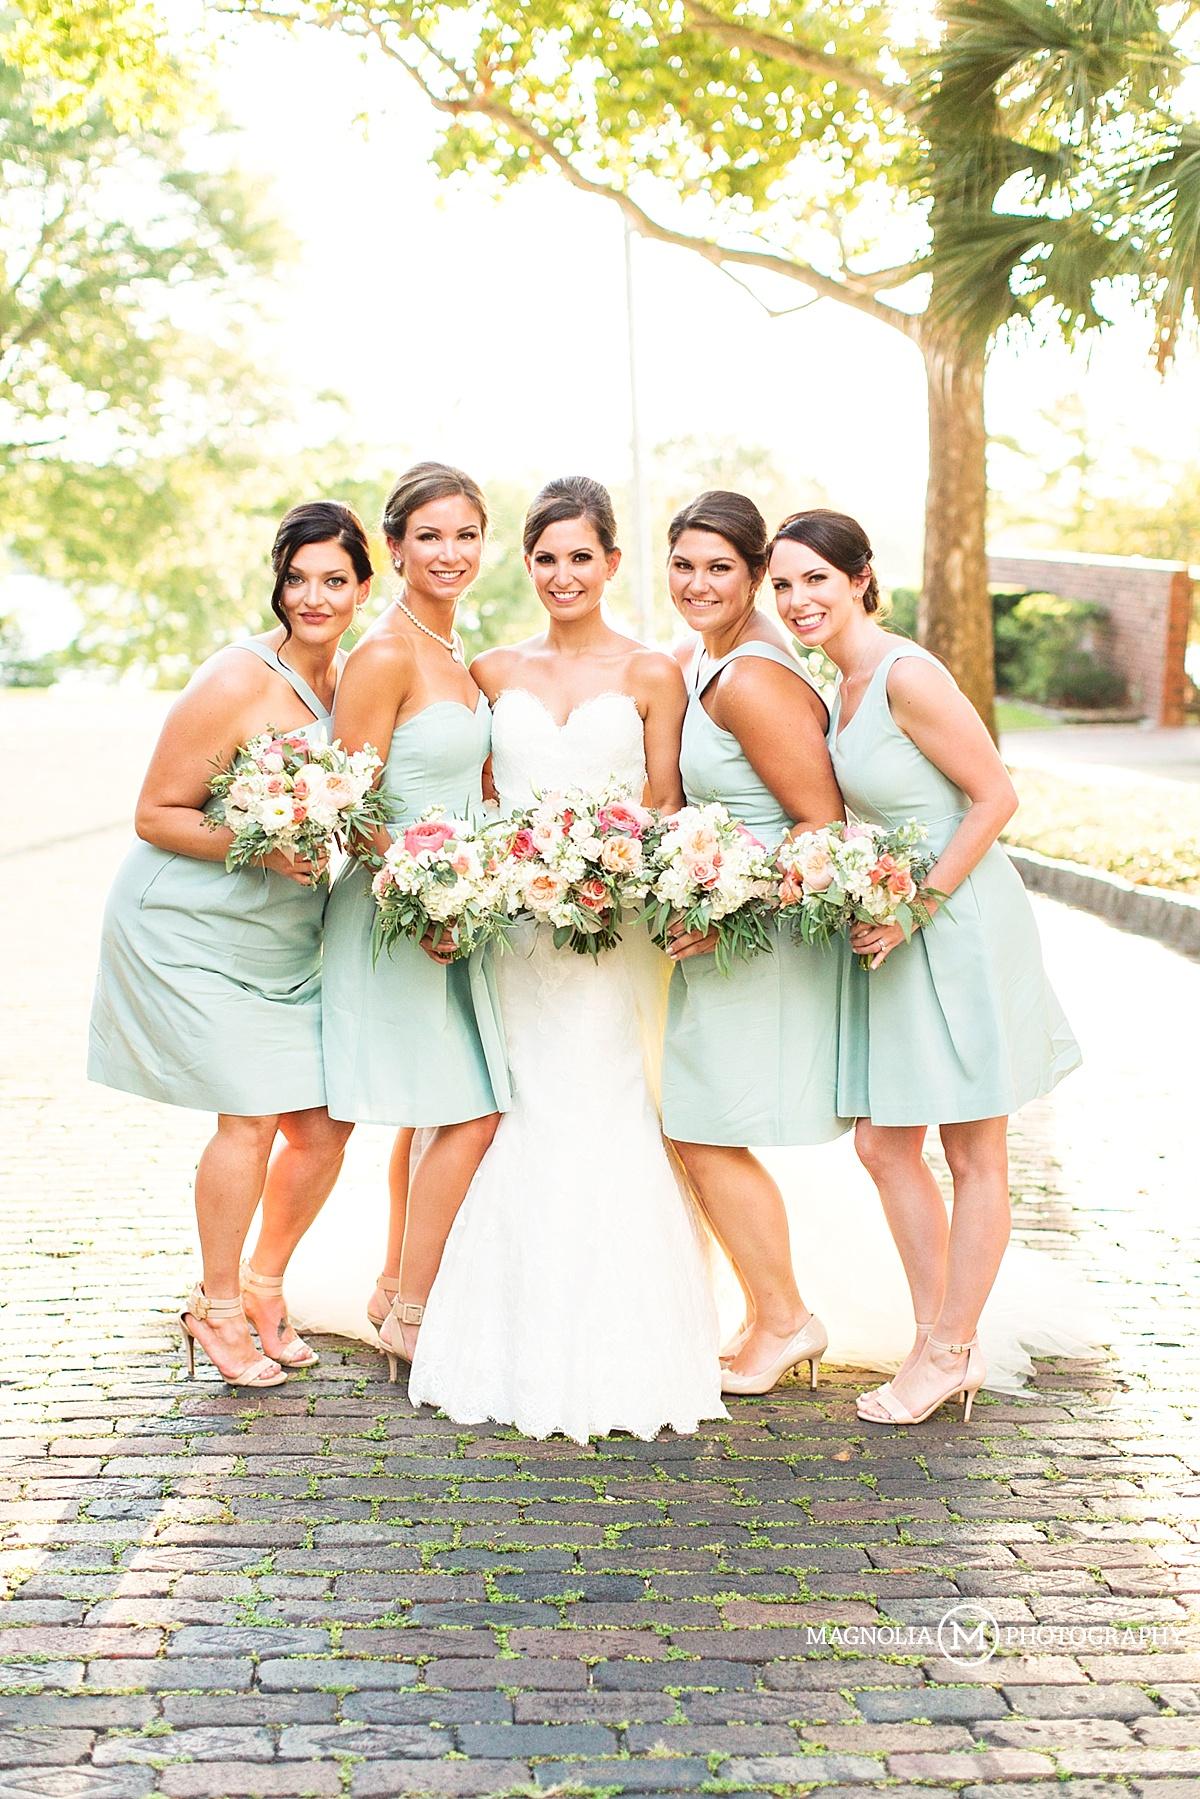 weddings at brooklyn arts center-52-1